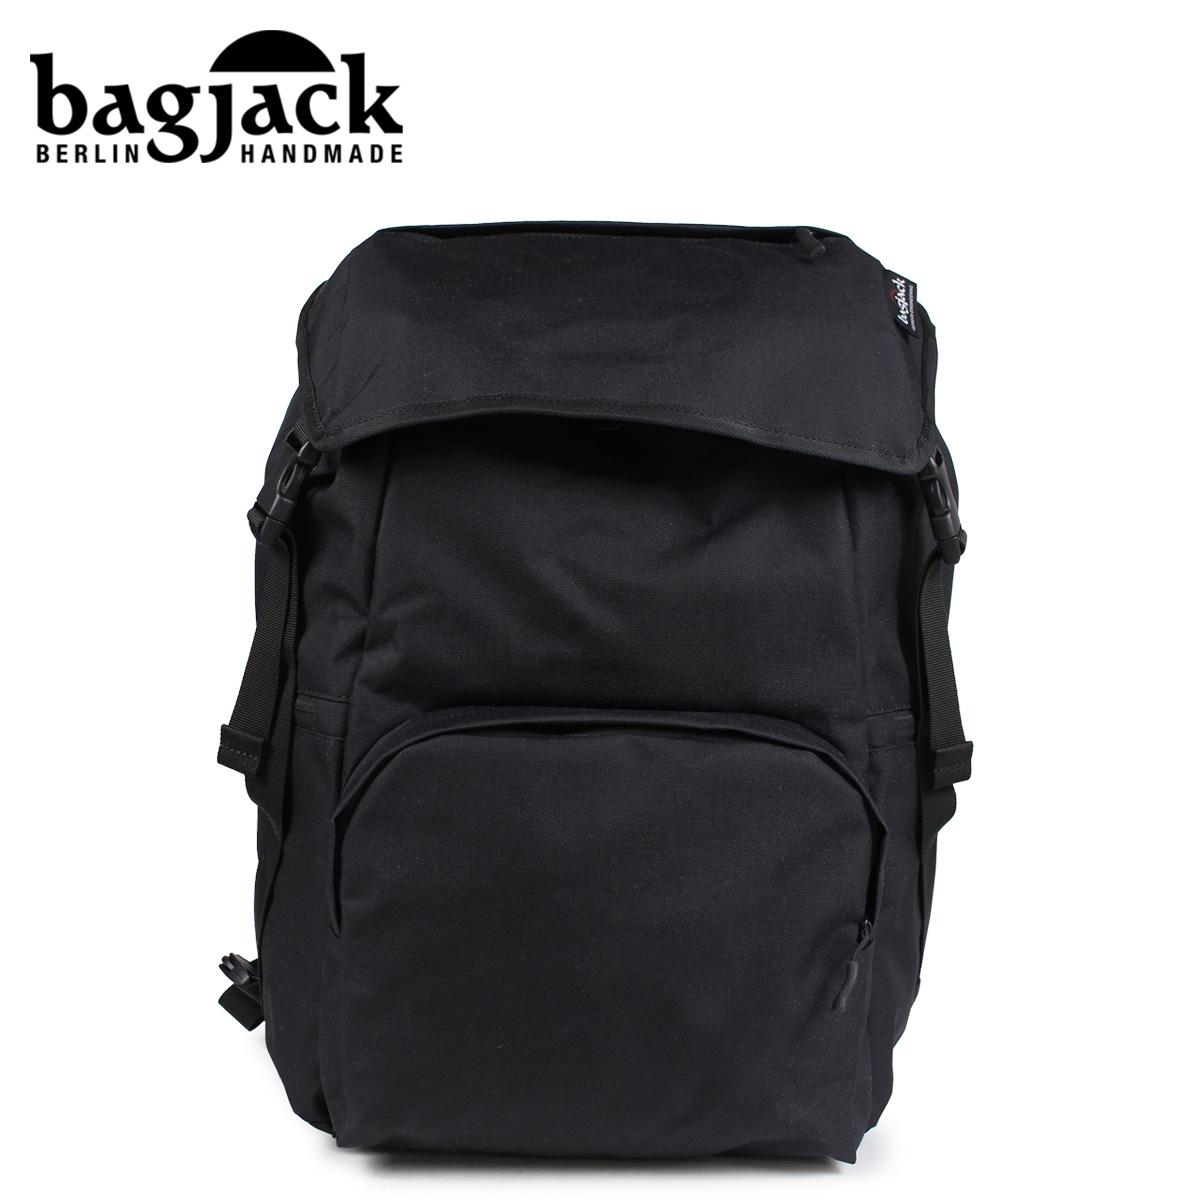 bagjack バッグジャック リュック バックパック メンズ レディース 17L RUCKSACK CLASSIC S ブラック